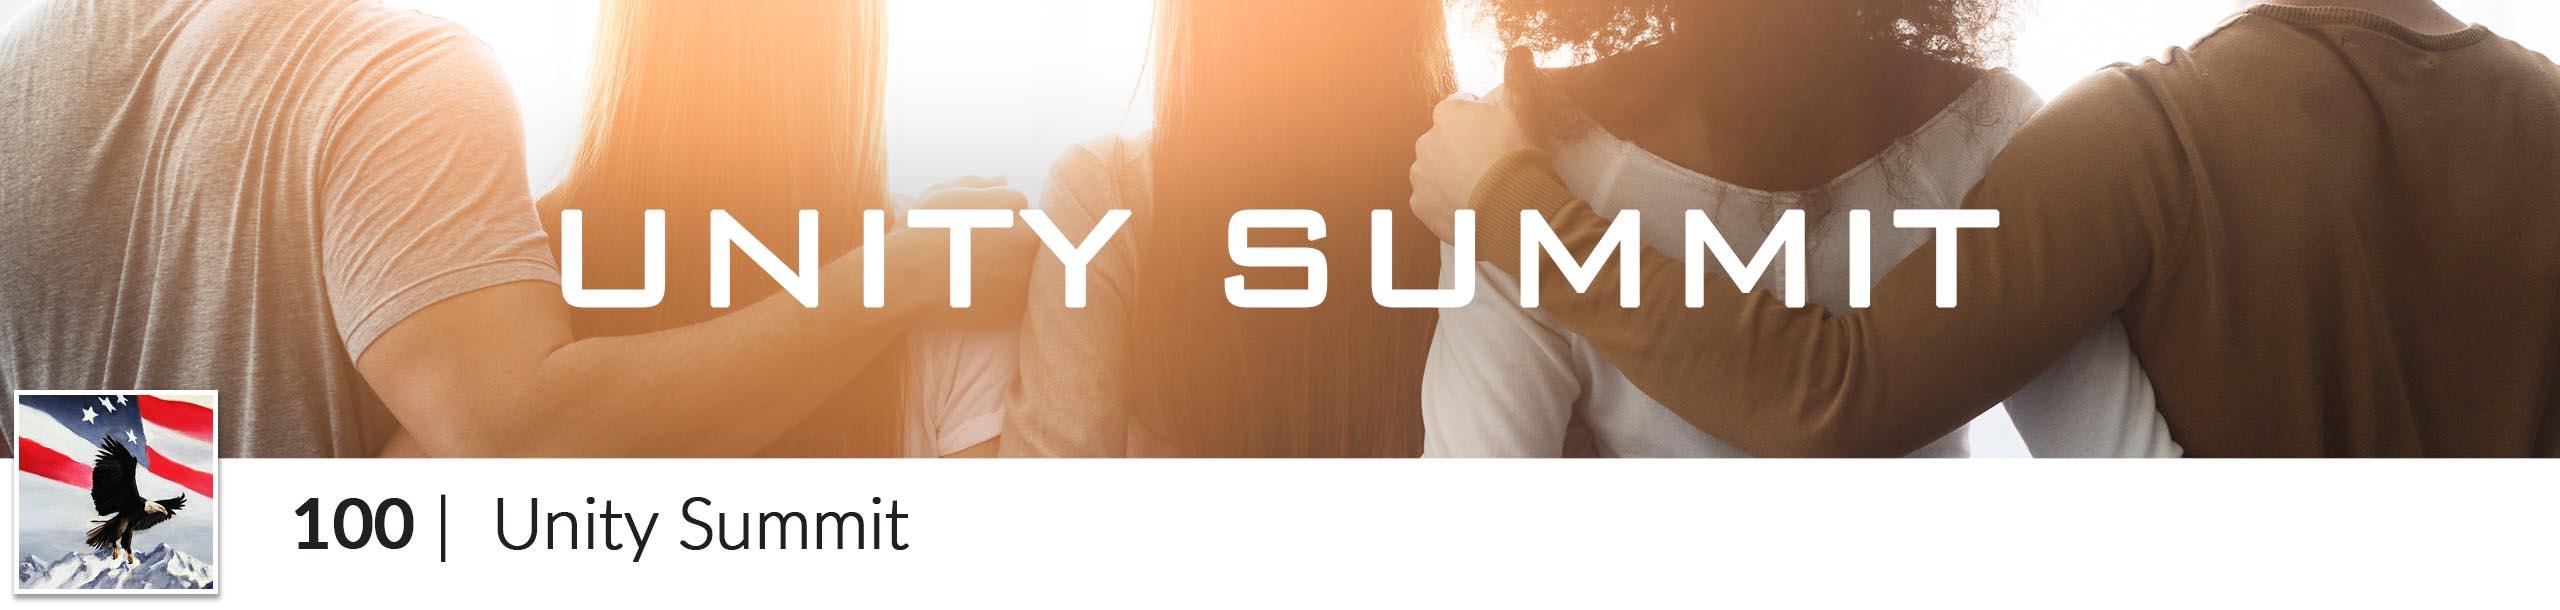 Unity_Summit-header01c